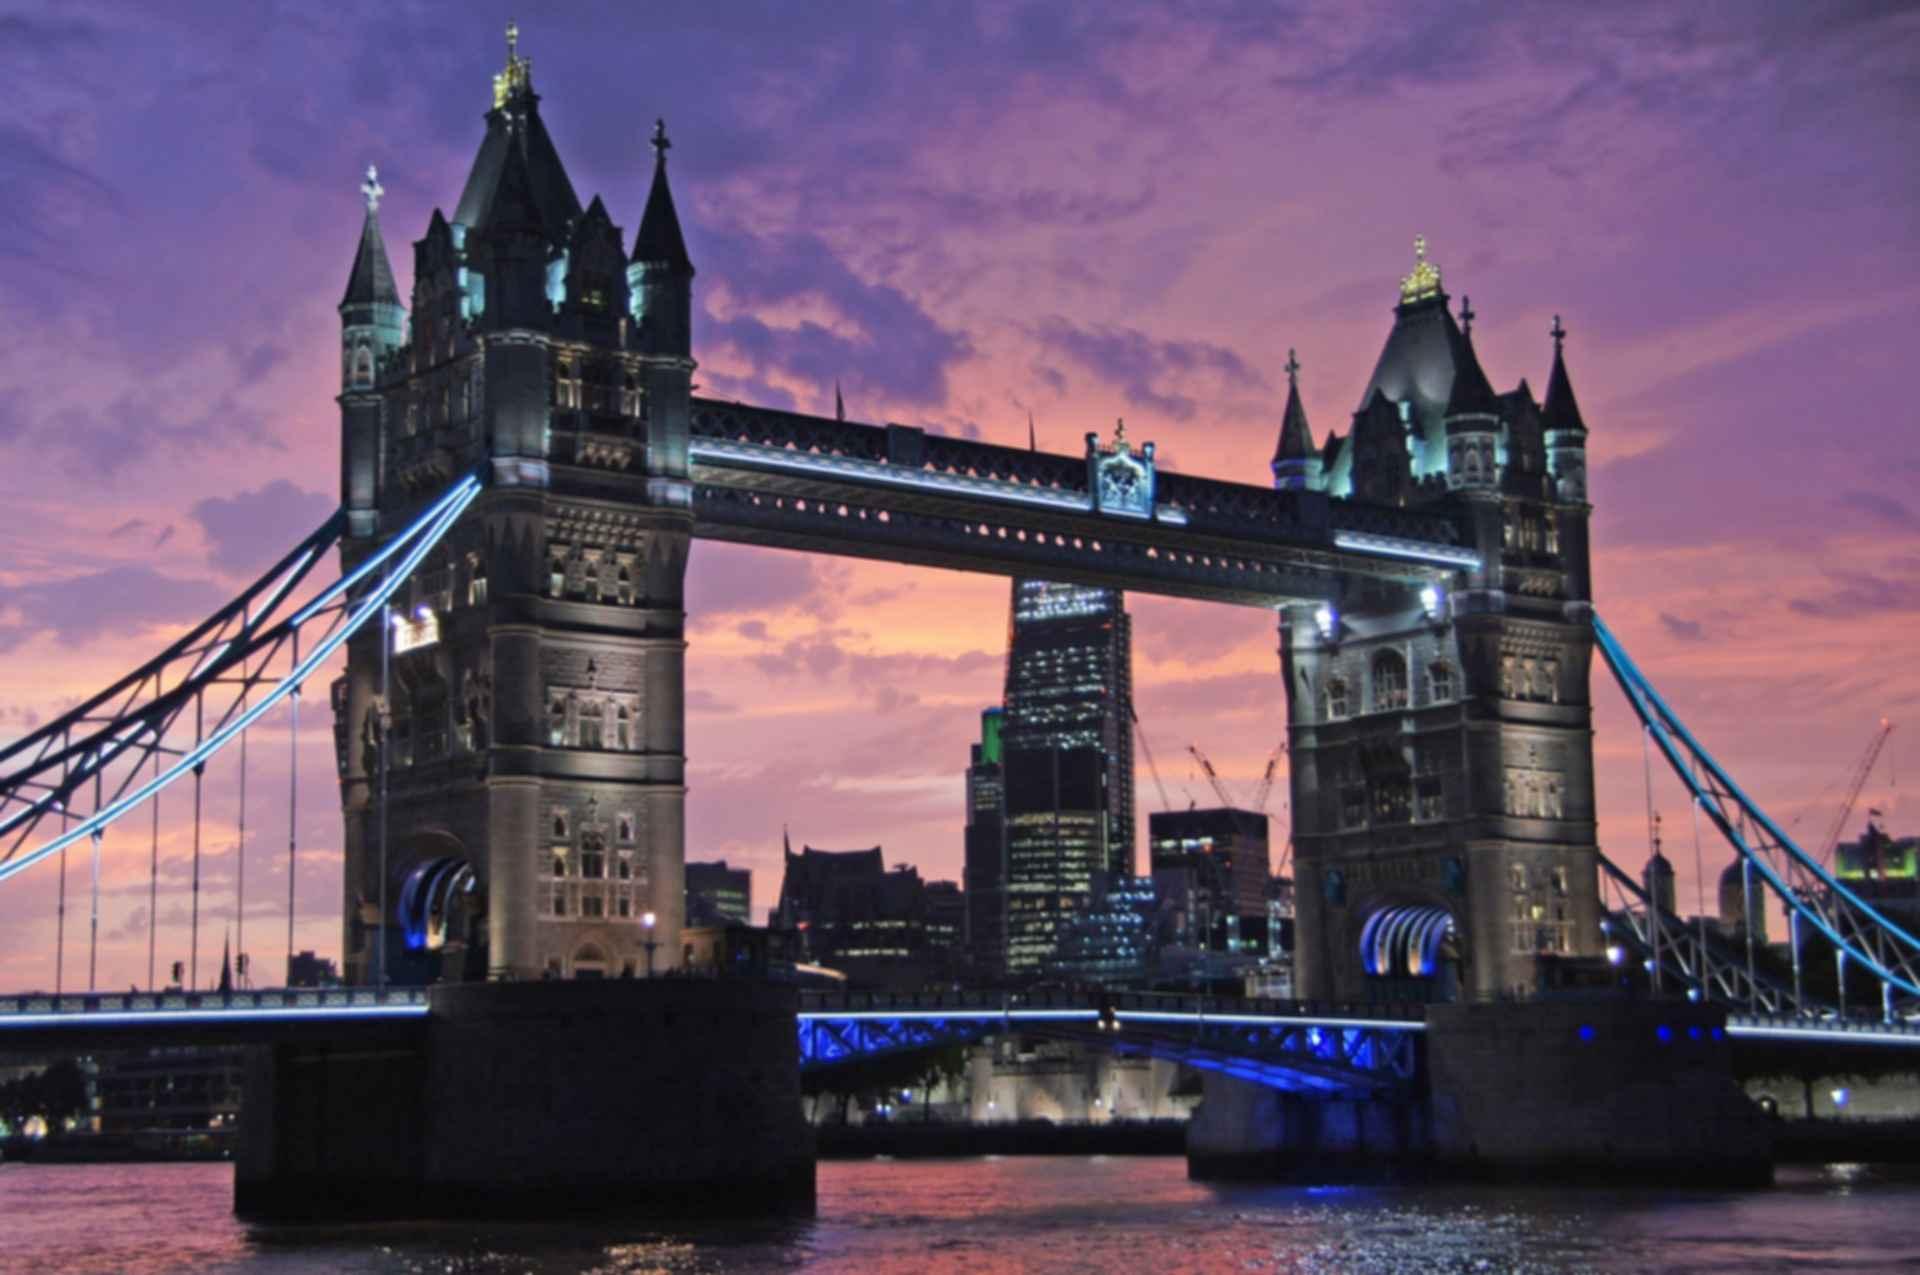 Tower Bridge - Sunset